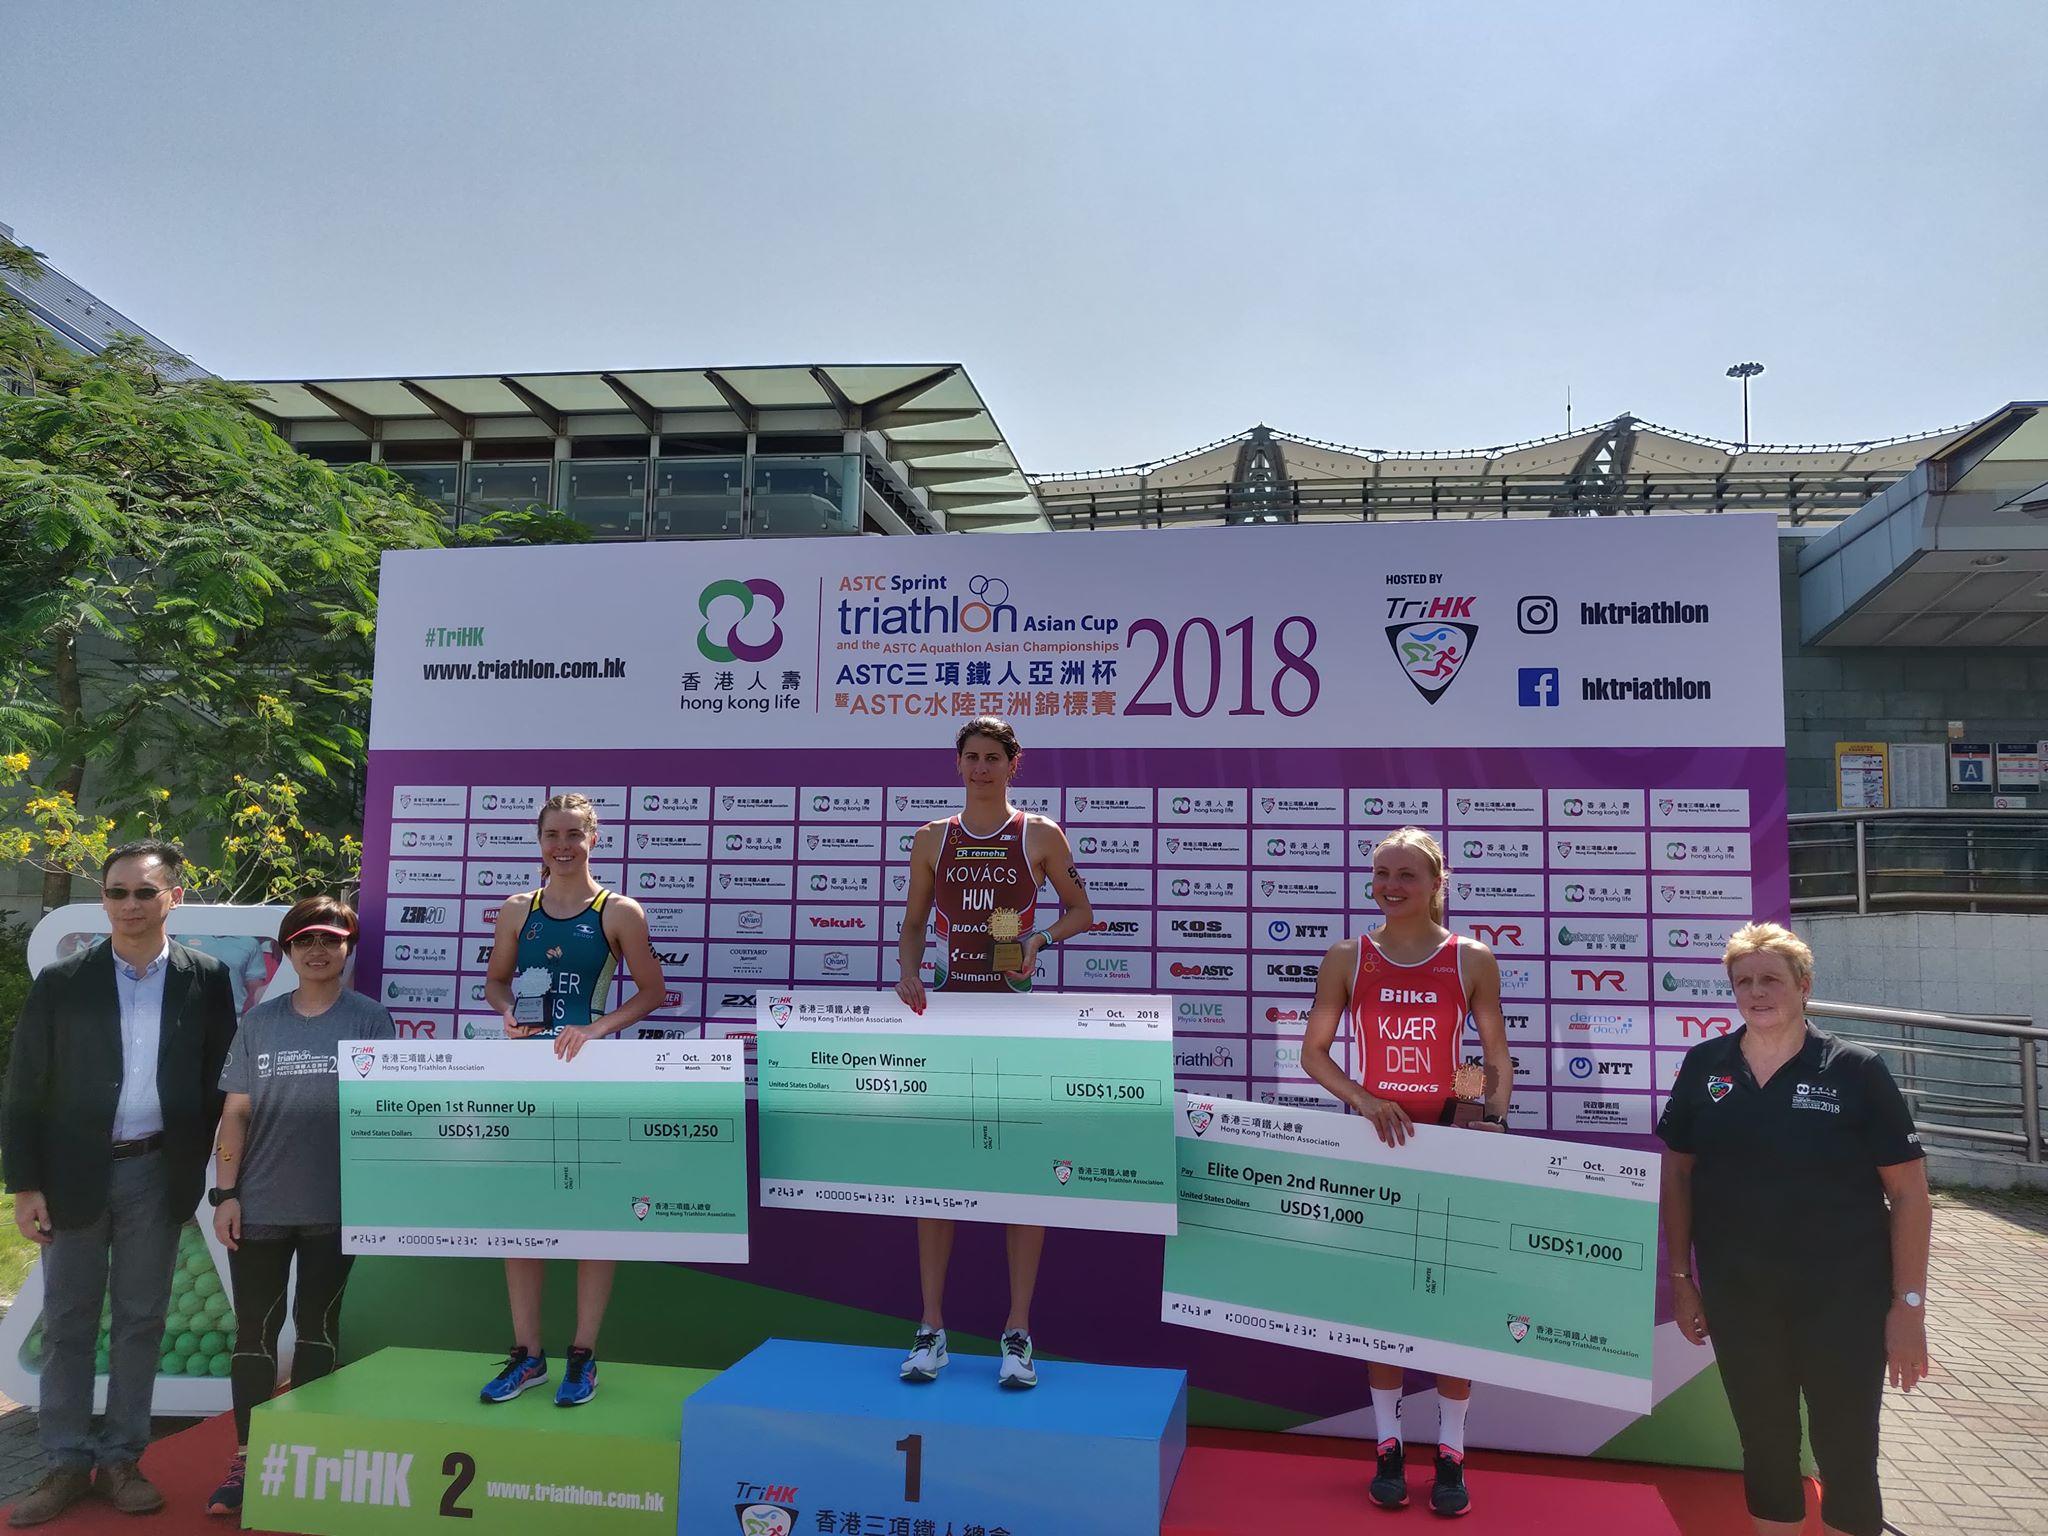 Alberte Kjær Pedersen 3'er i Hong Kong Asian Cup